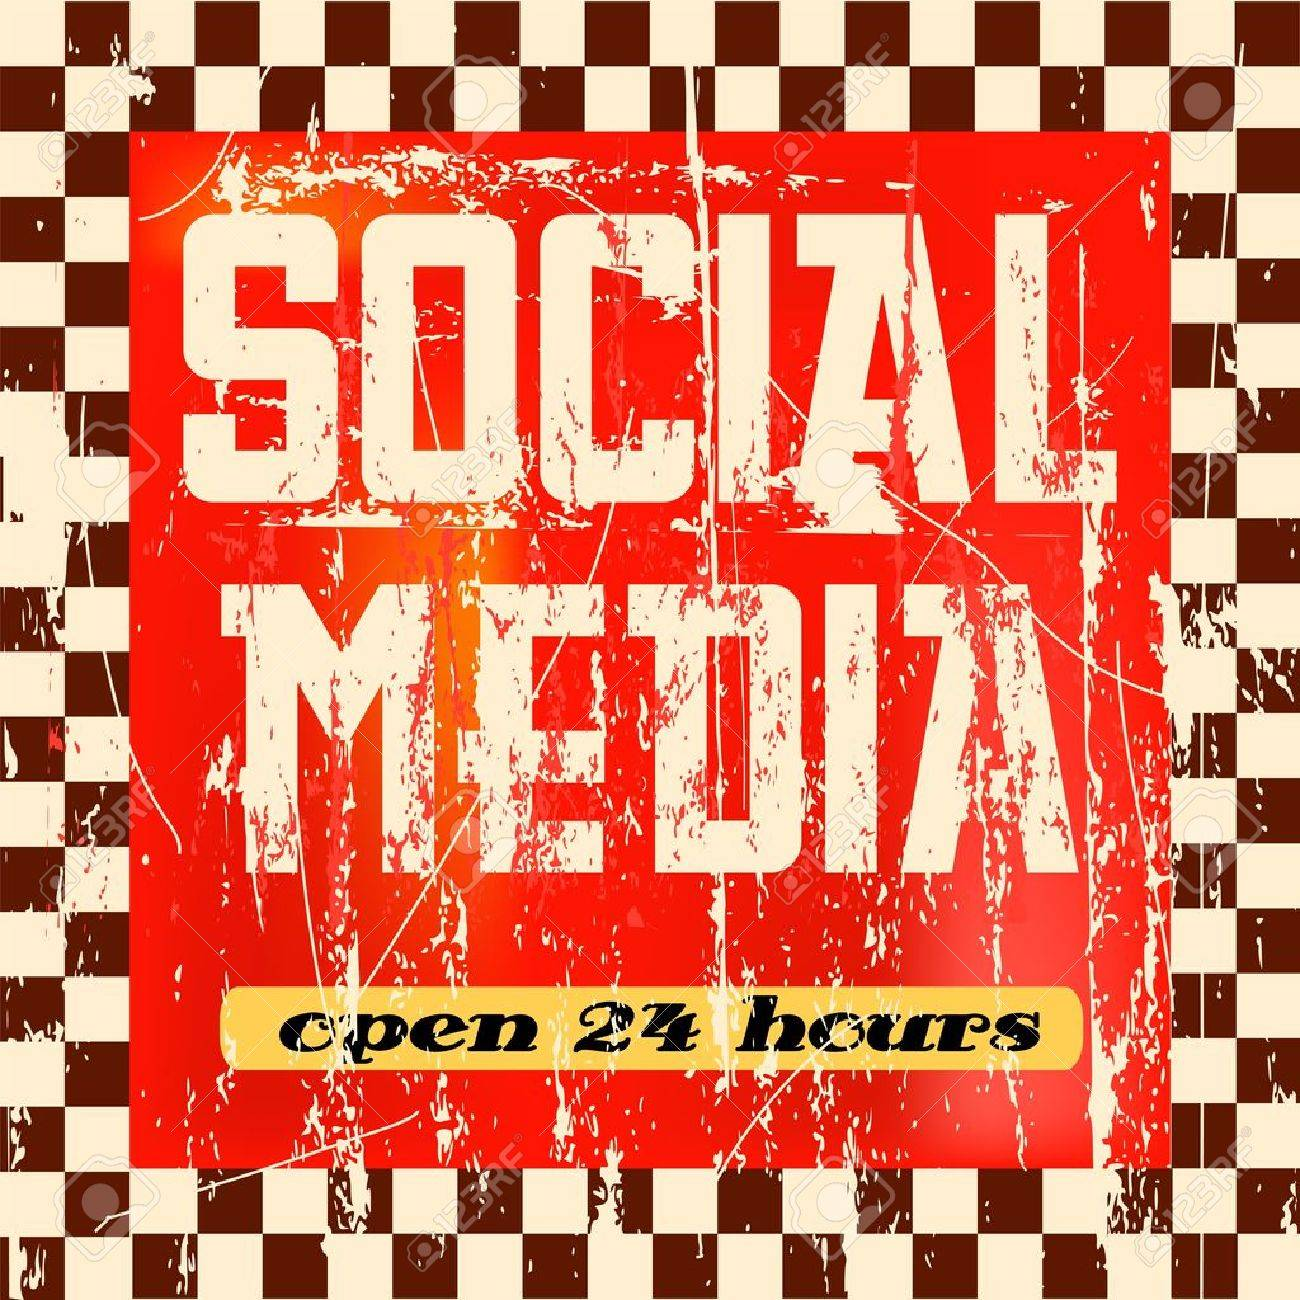 vintage social media sign Stock Vector - 14691333